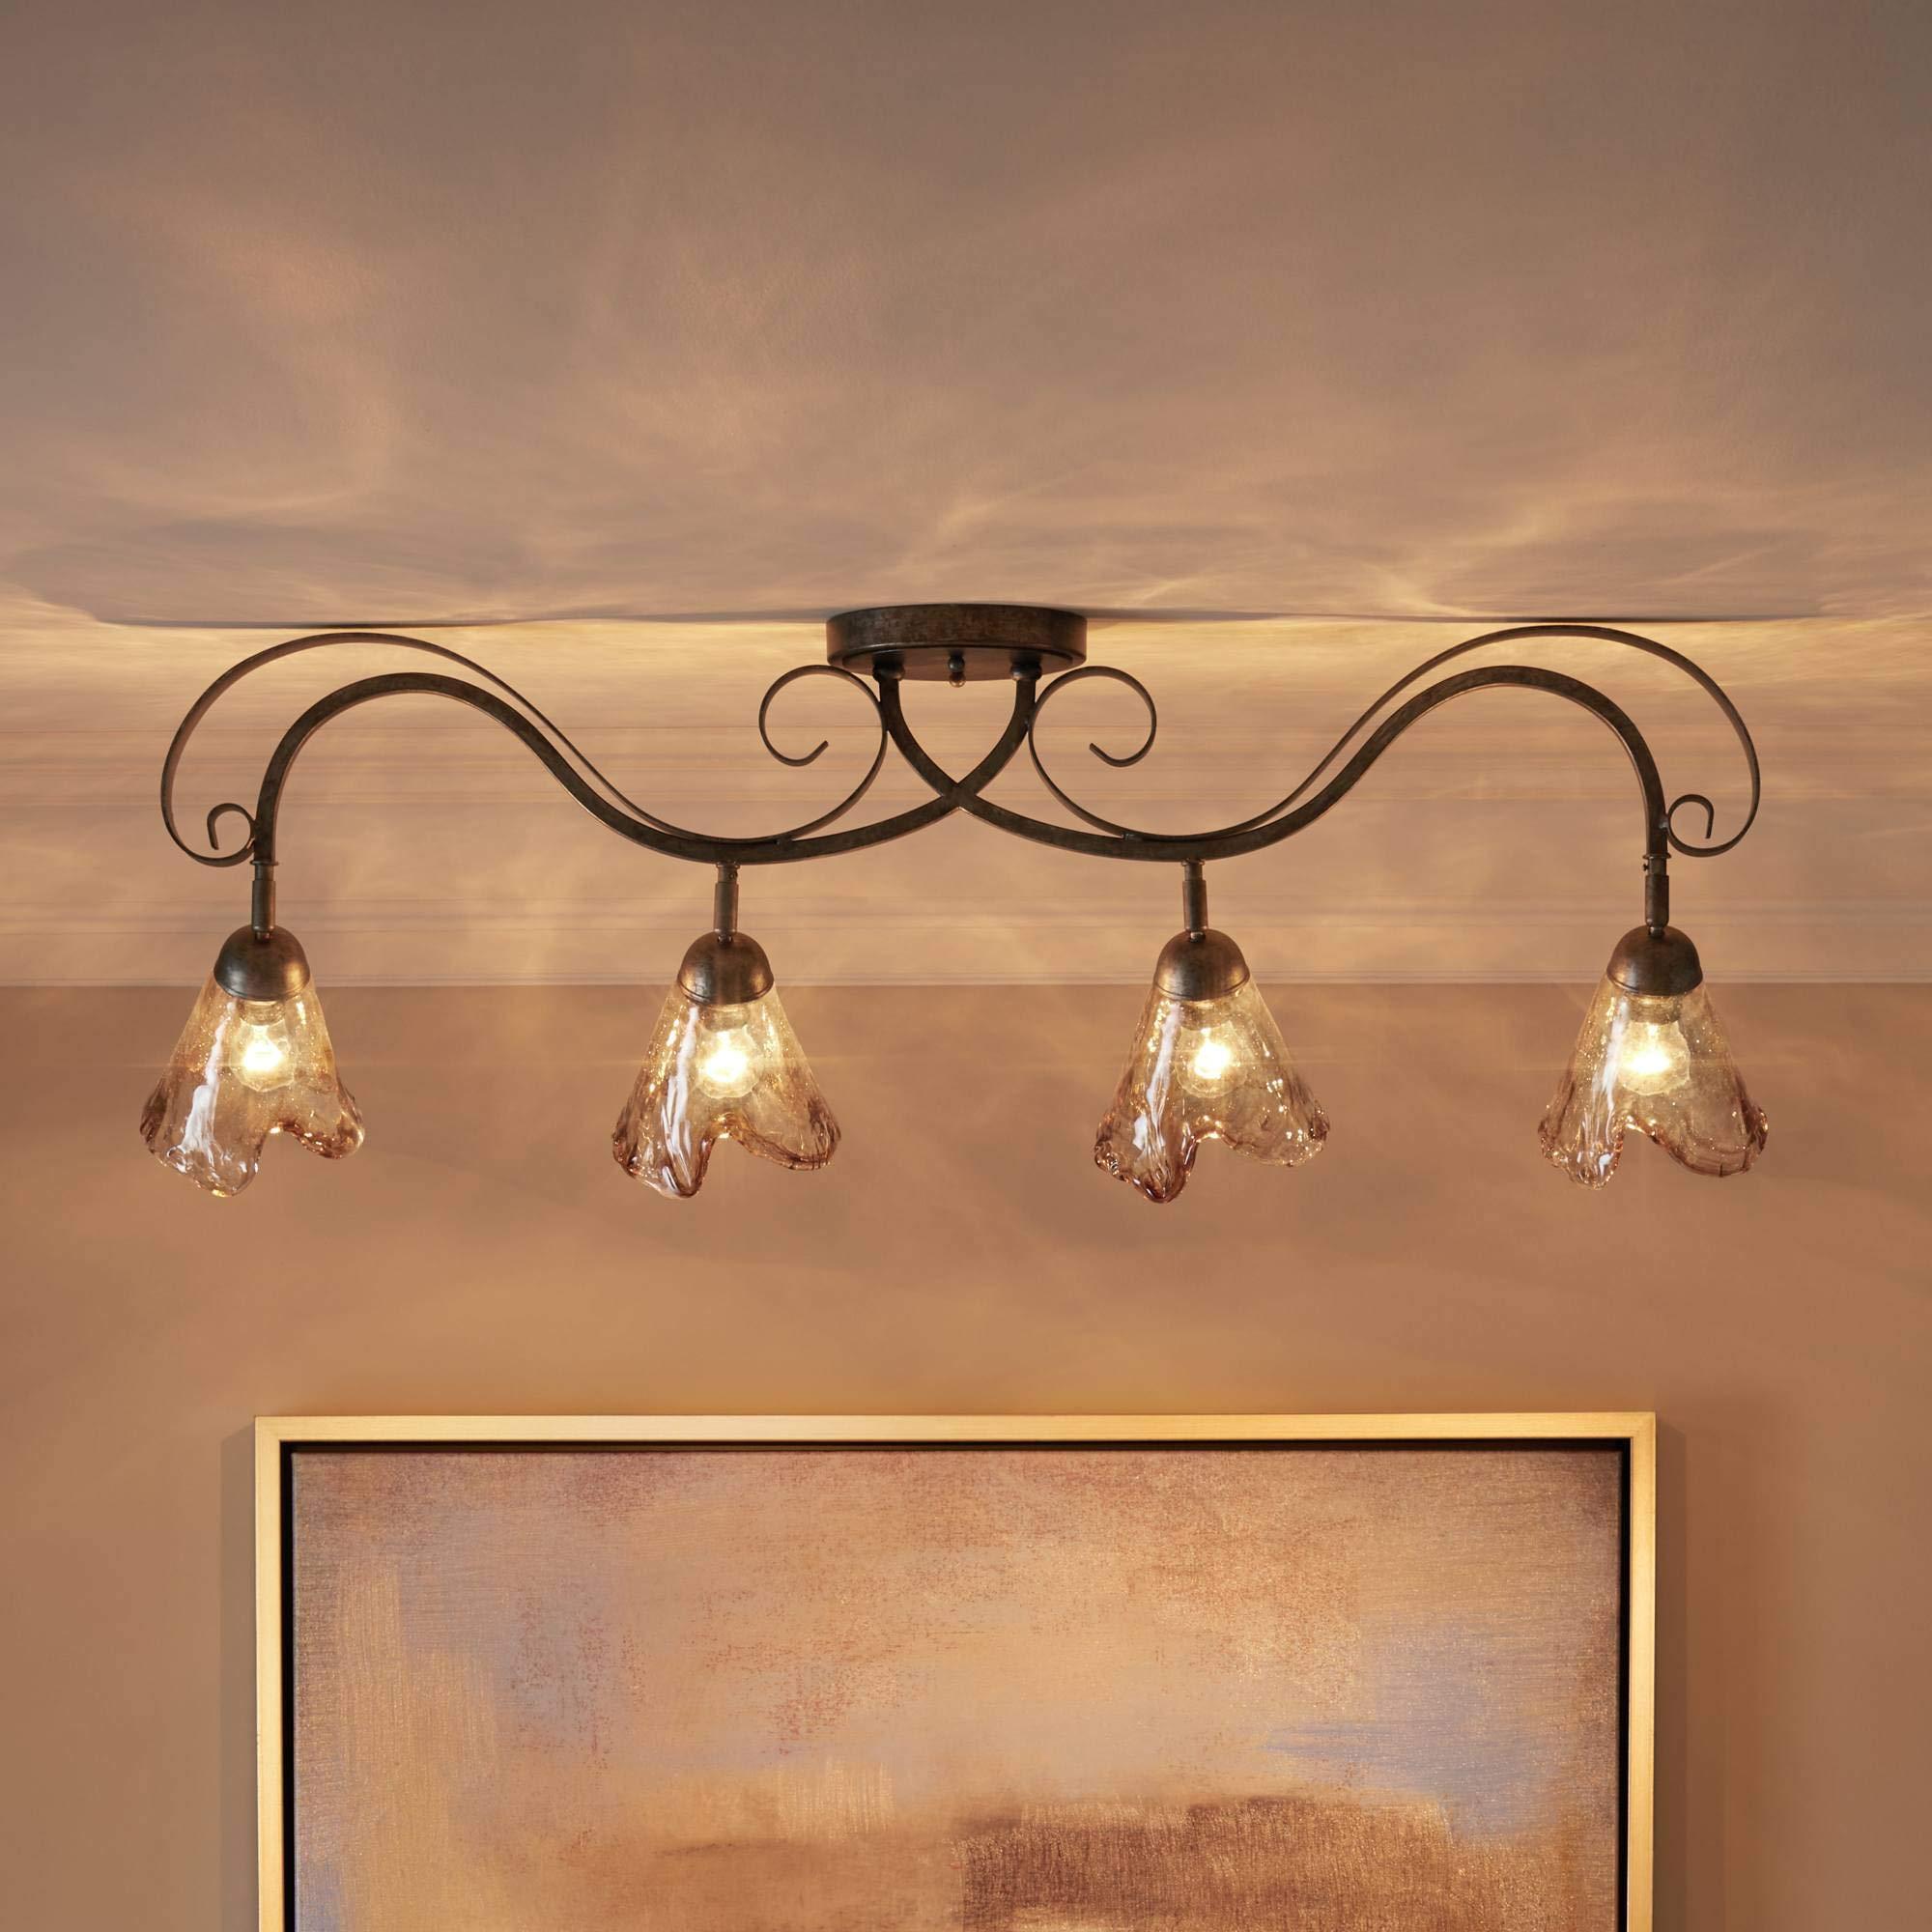 Organic Amber Glass 4-Light Ceiling Track Fixture - Pro Track